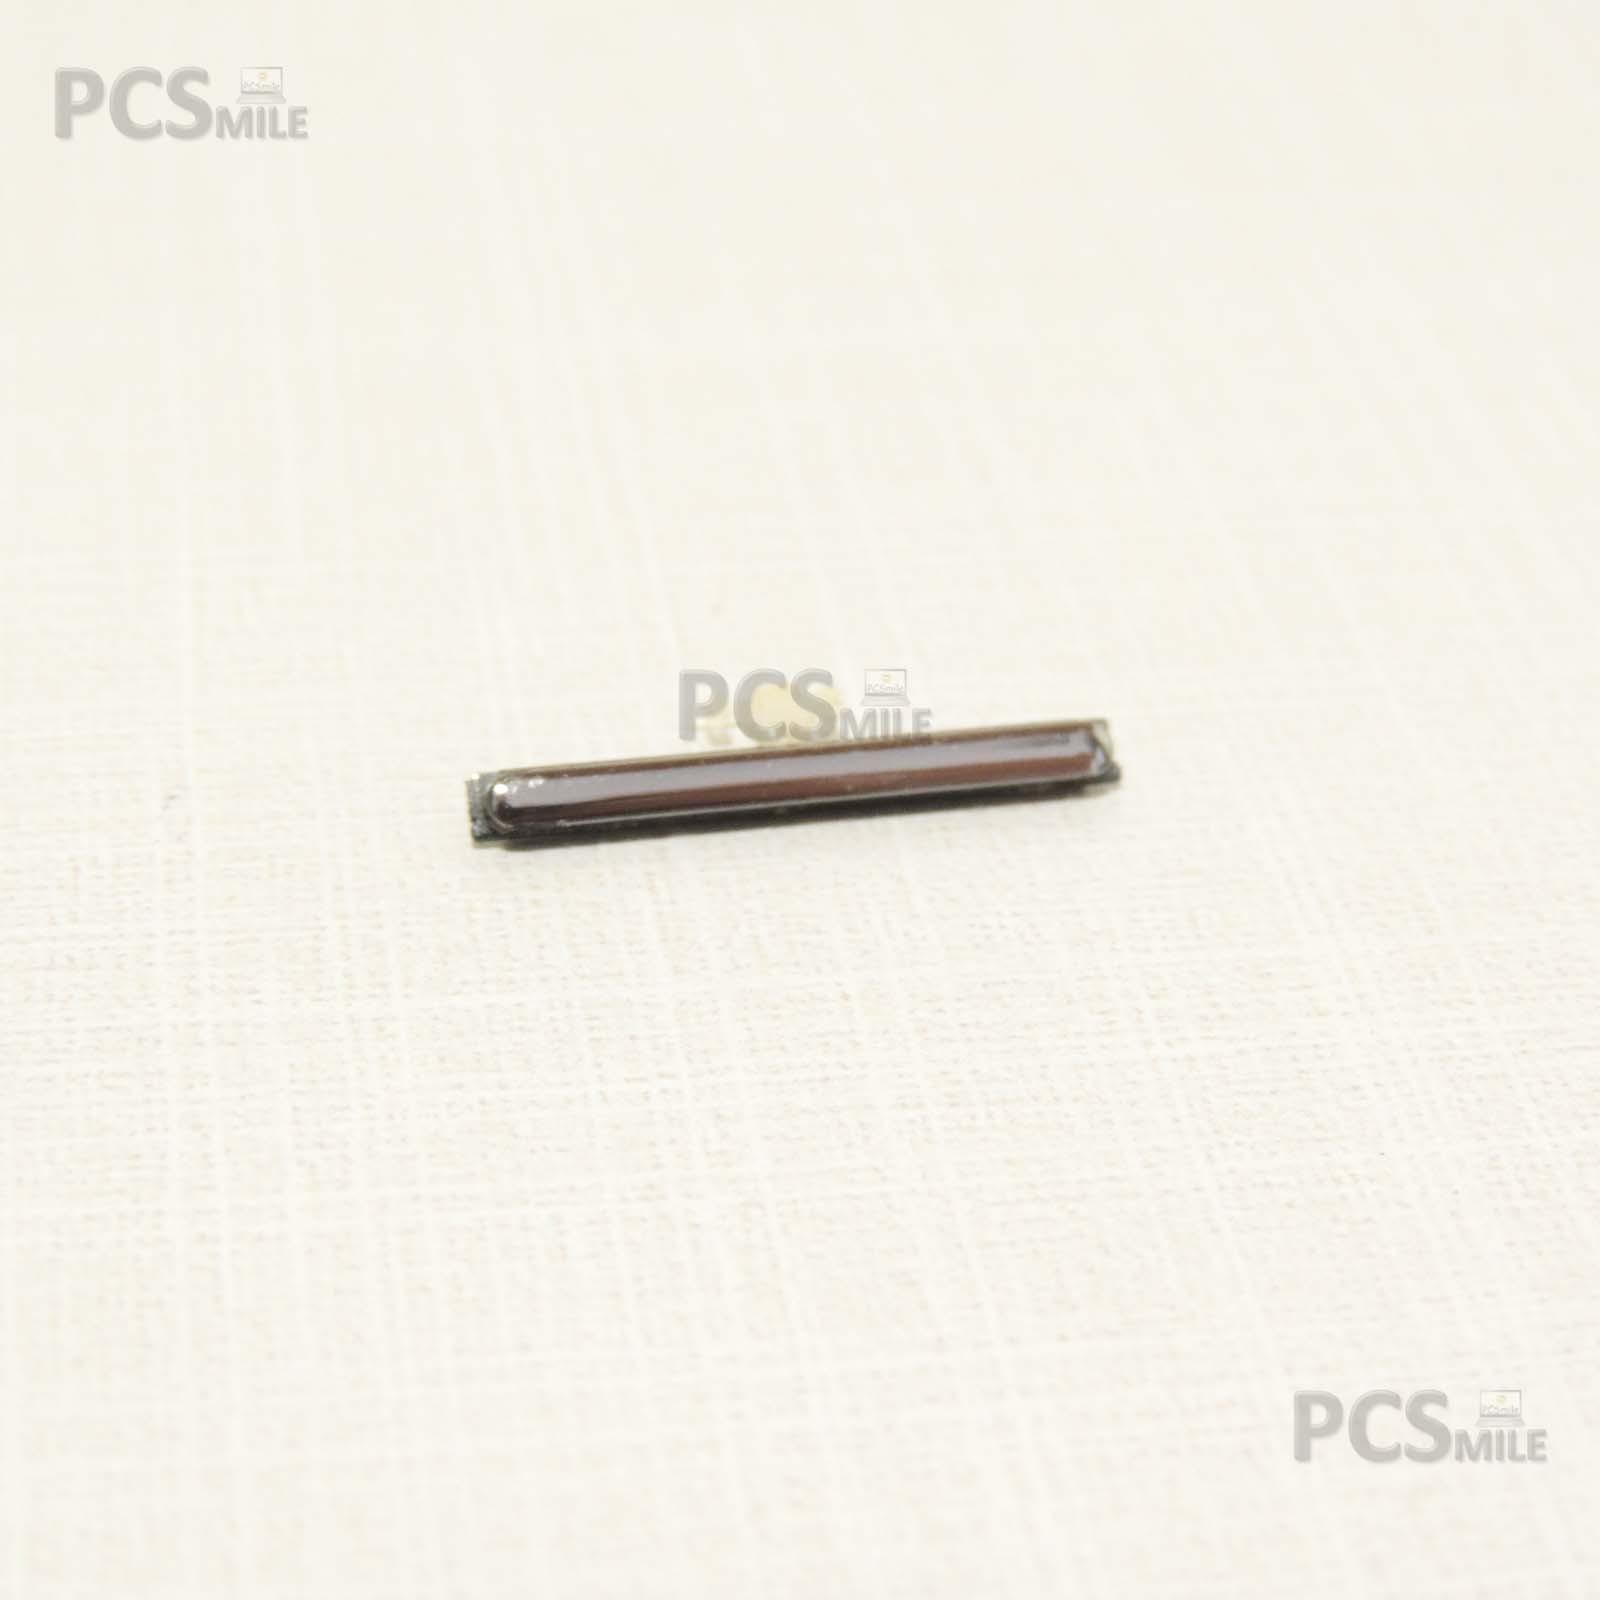 Tasti esterni volume Nexus 4 LG-E960 tasto laterale audio tastini tastino